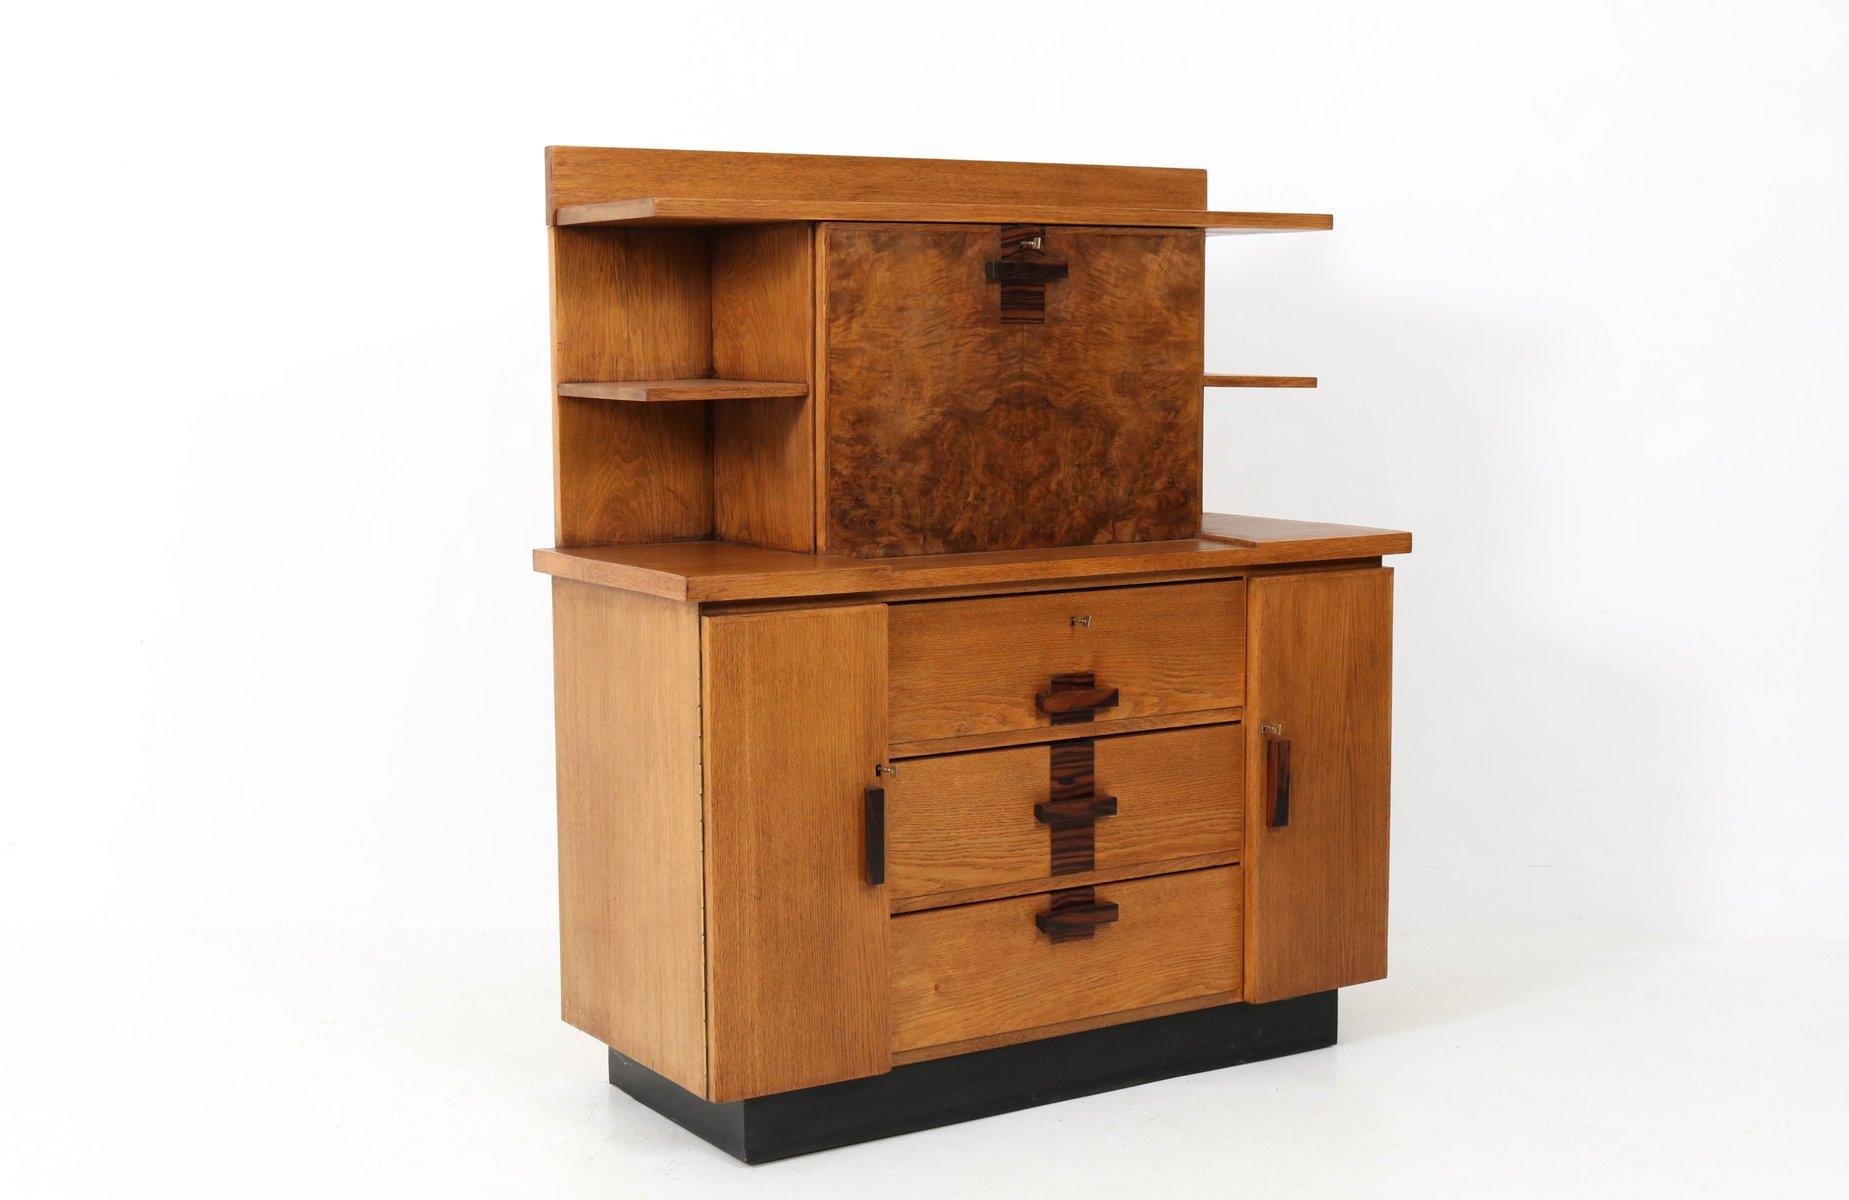 art deco haagse school secretaire by p e l izeren for de genneper molen 1920s for sale at pamono. Black Bedroom Furniture Sets. Home Design Ideas